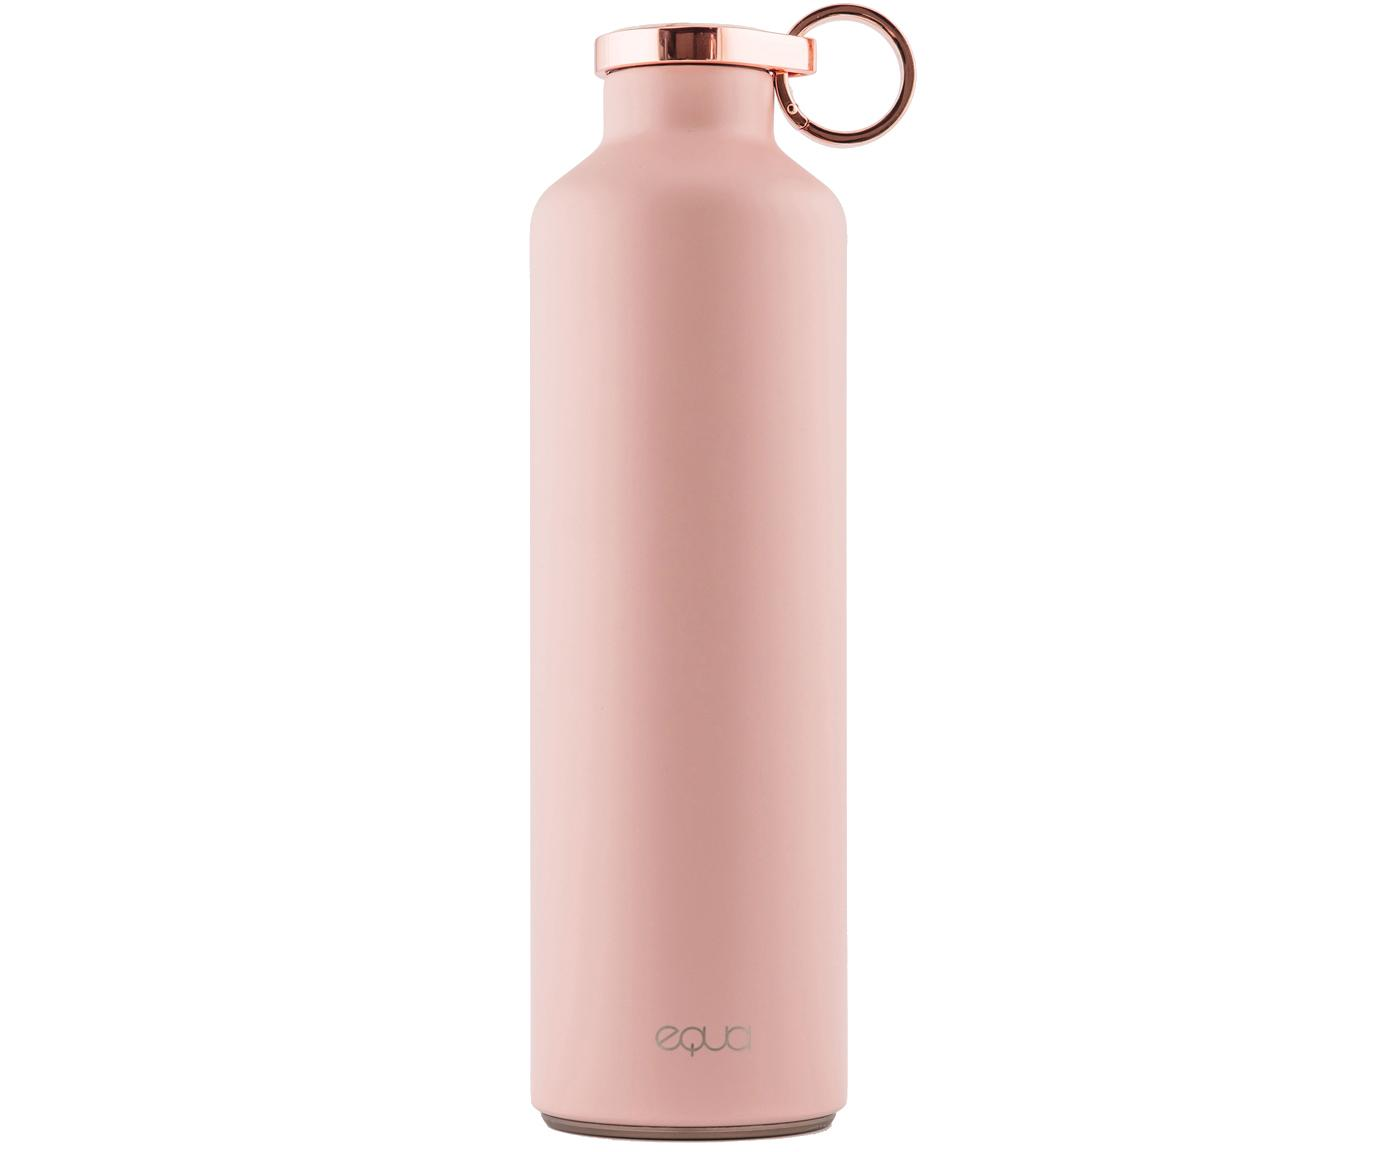 Borraccia termica Basic, Acciaio inossidabile, rivestito, Rosa, rame, Ø 8 x Alt. 26 cm